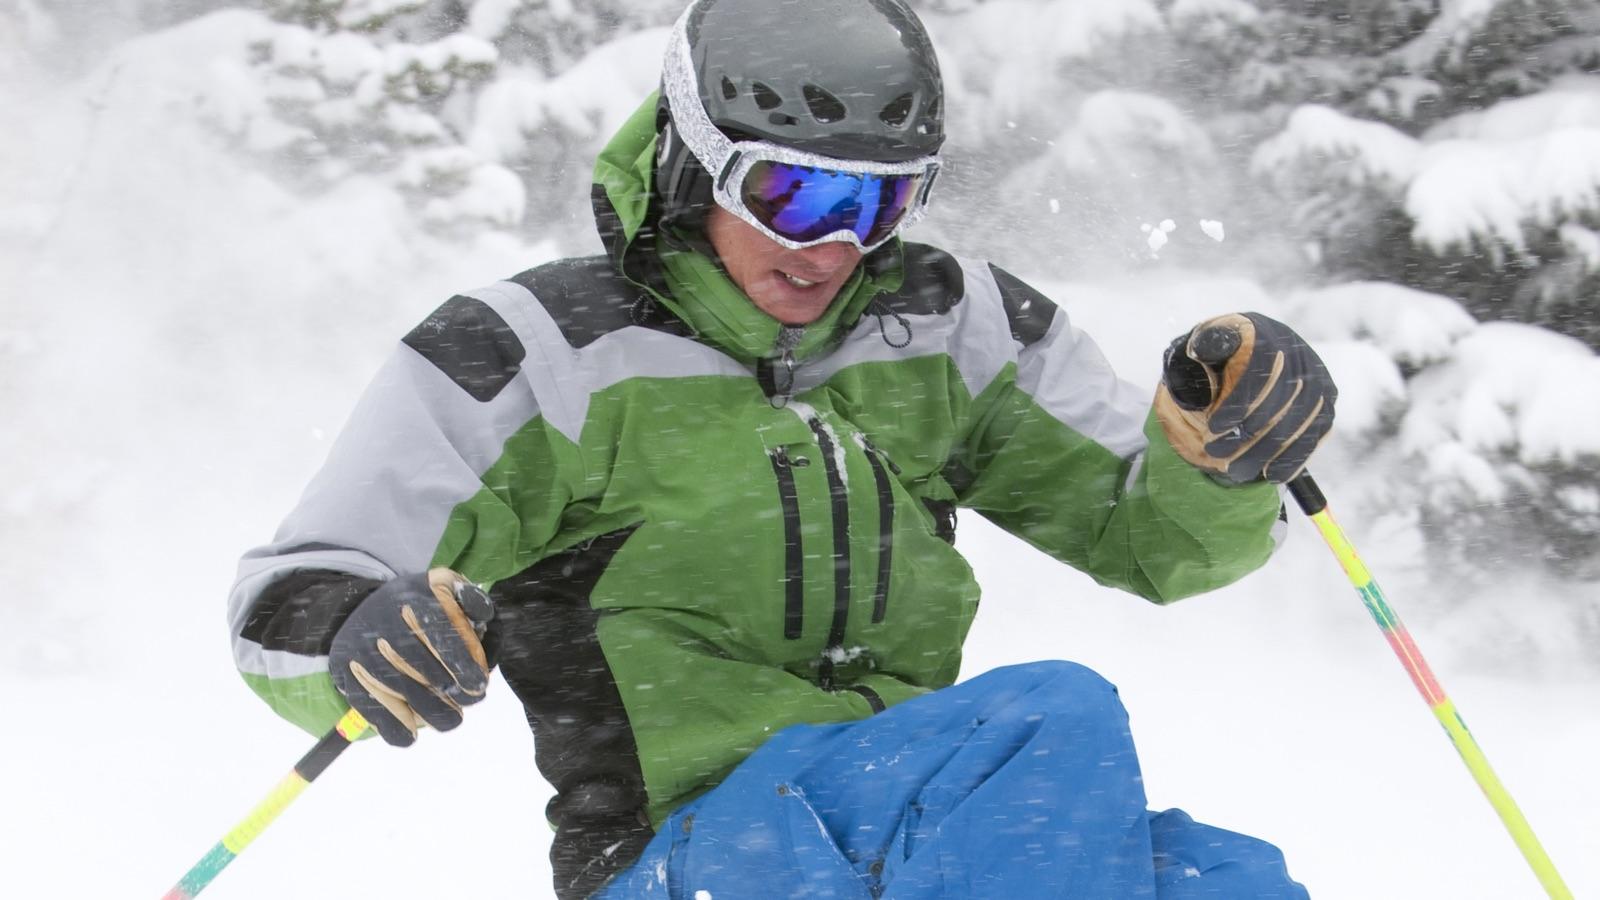 mbo4leisuresports-ski-instructor-sportopleiding